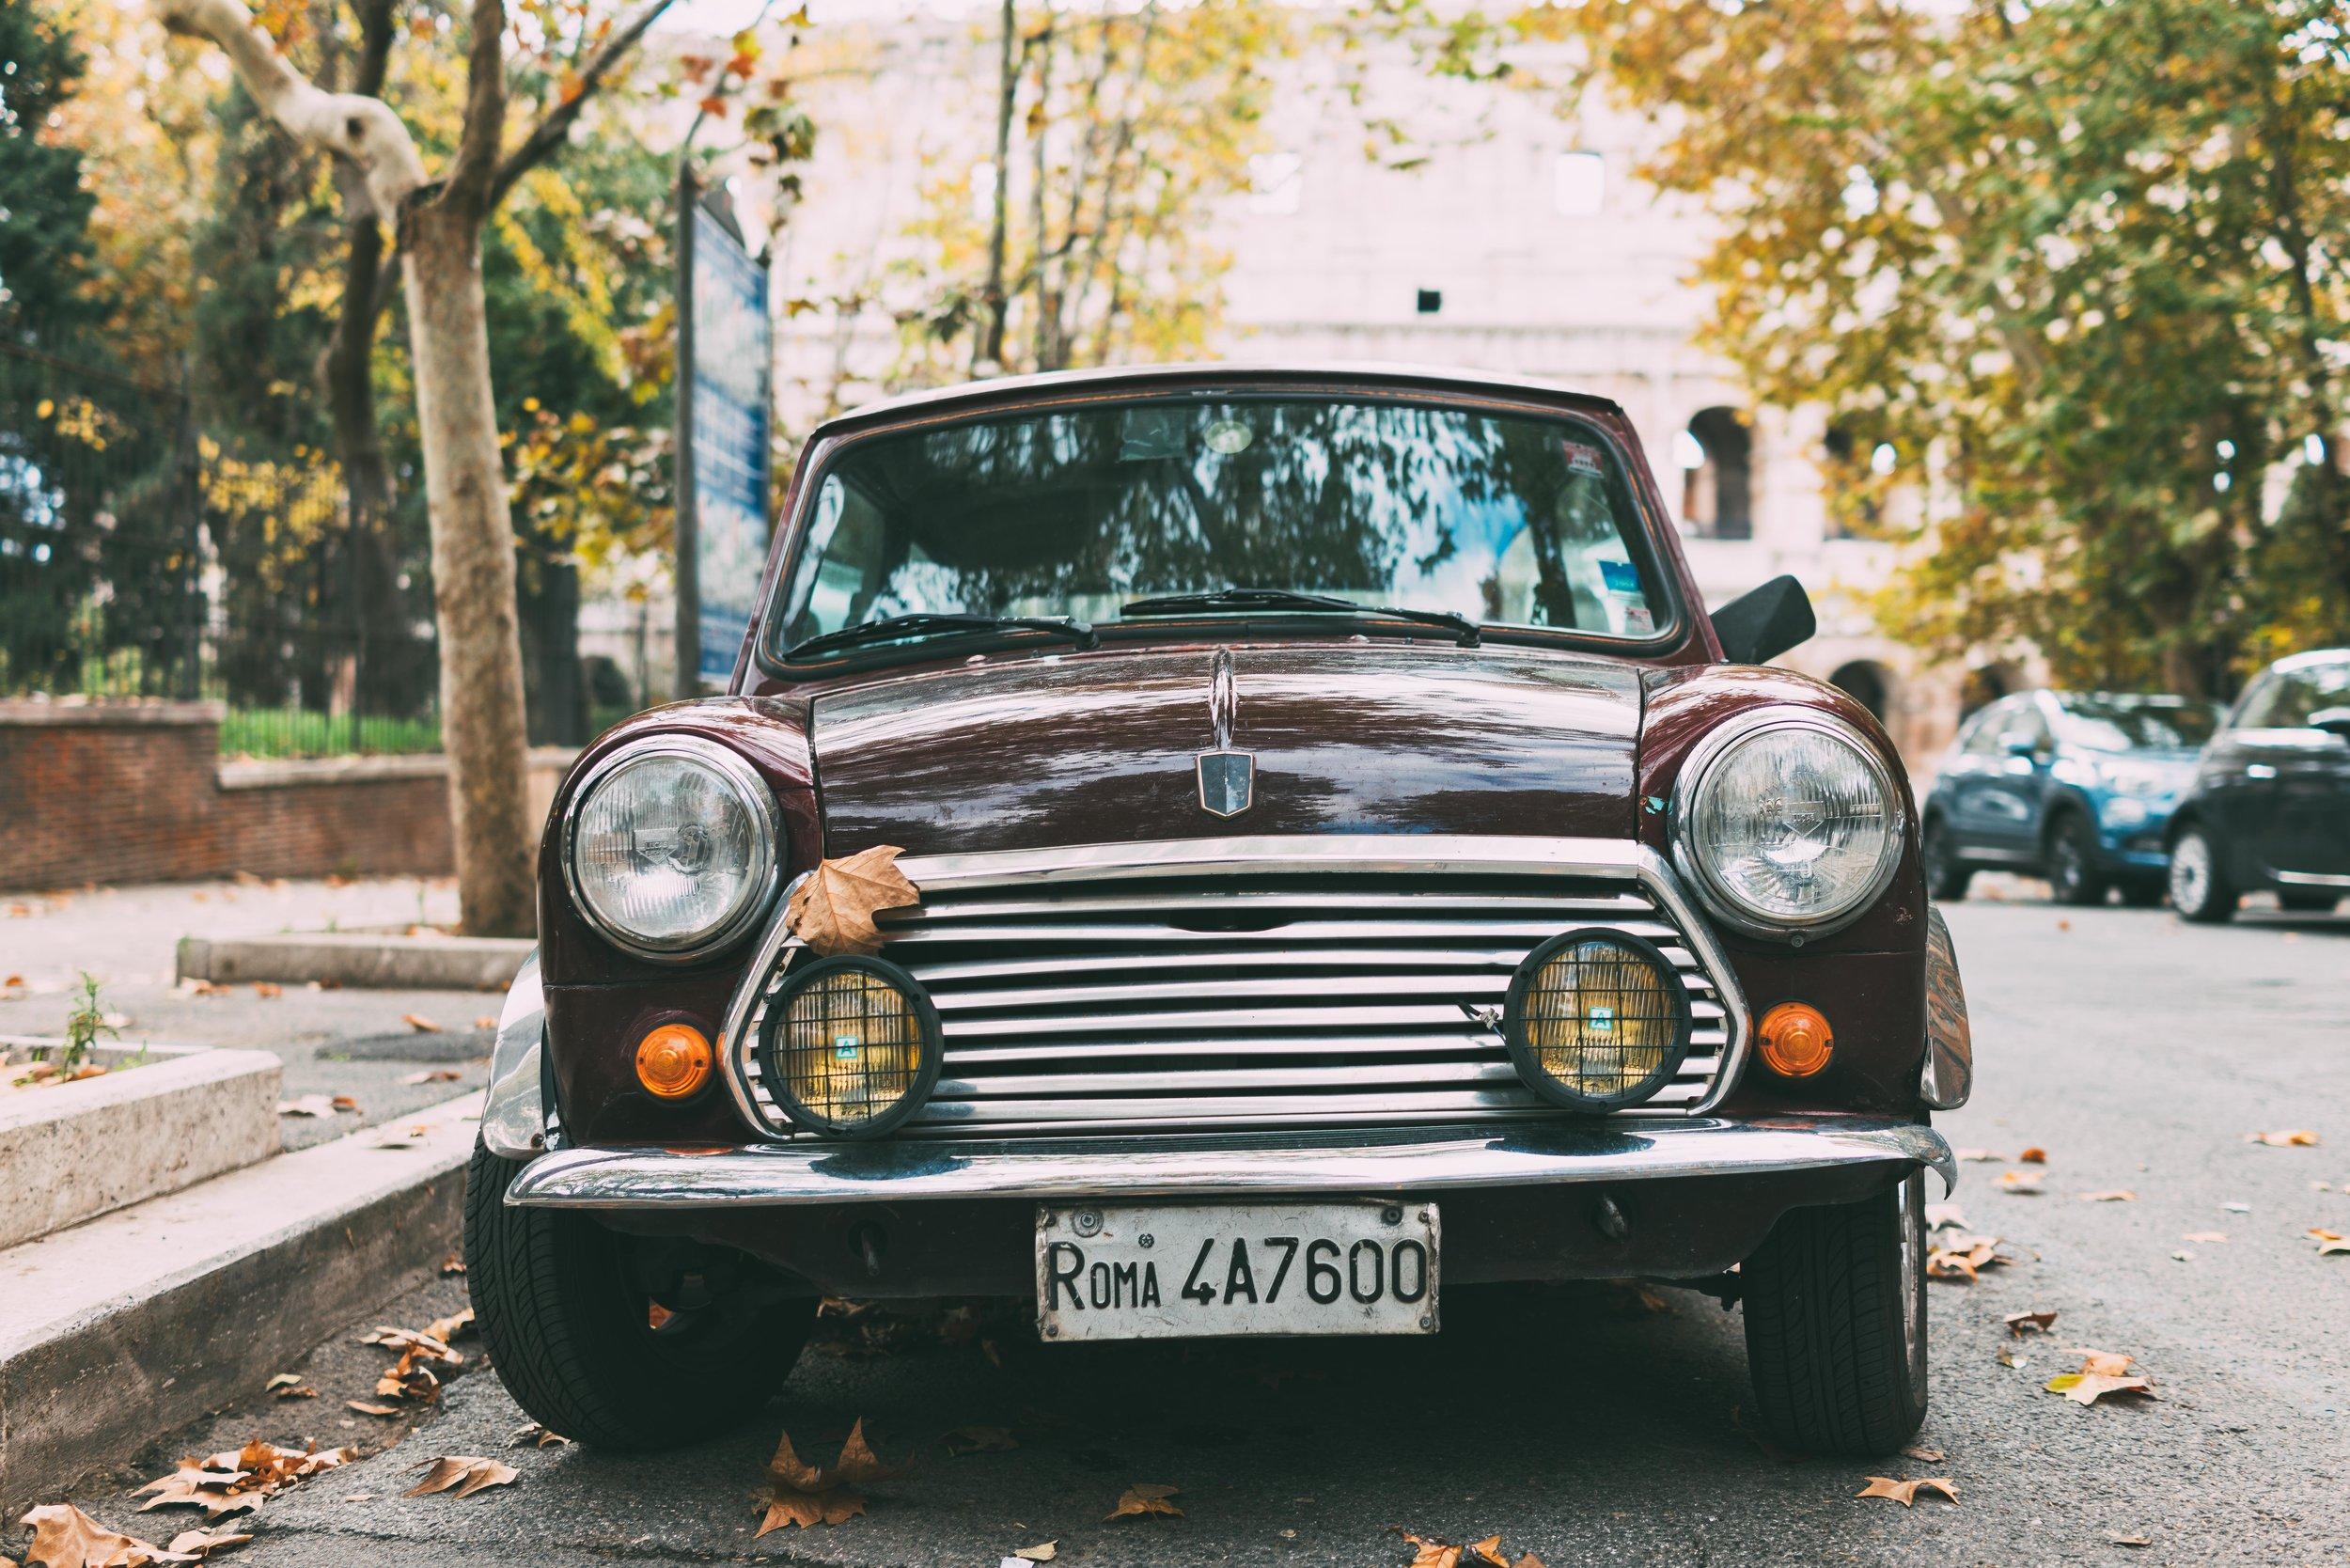 Vintage Rome Car.jpg